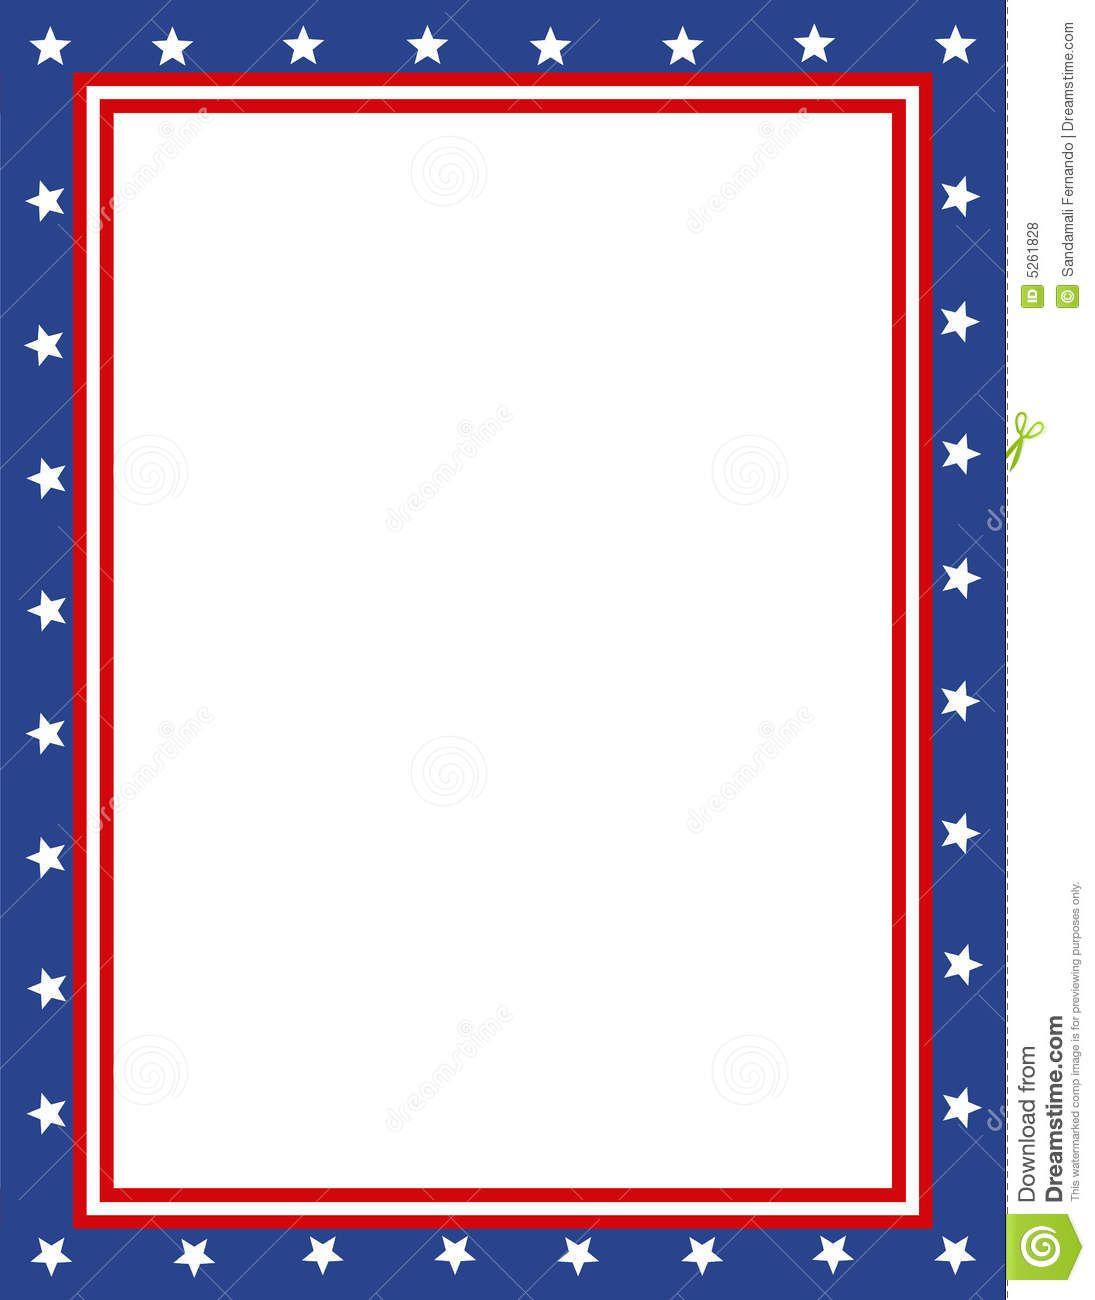 The Obama-Clinton Cloward-Piven baton